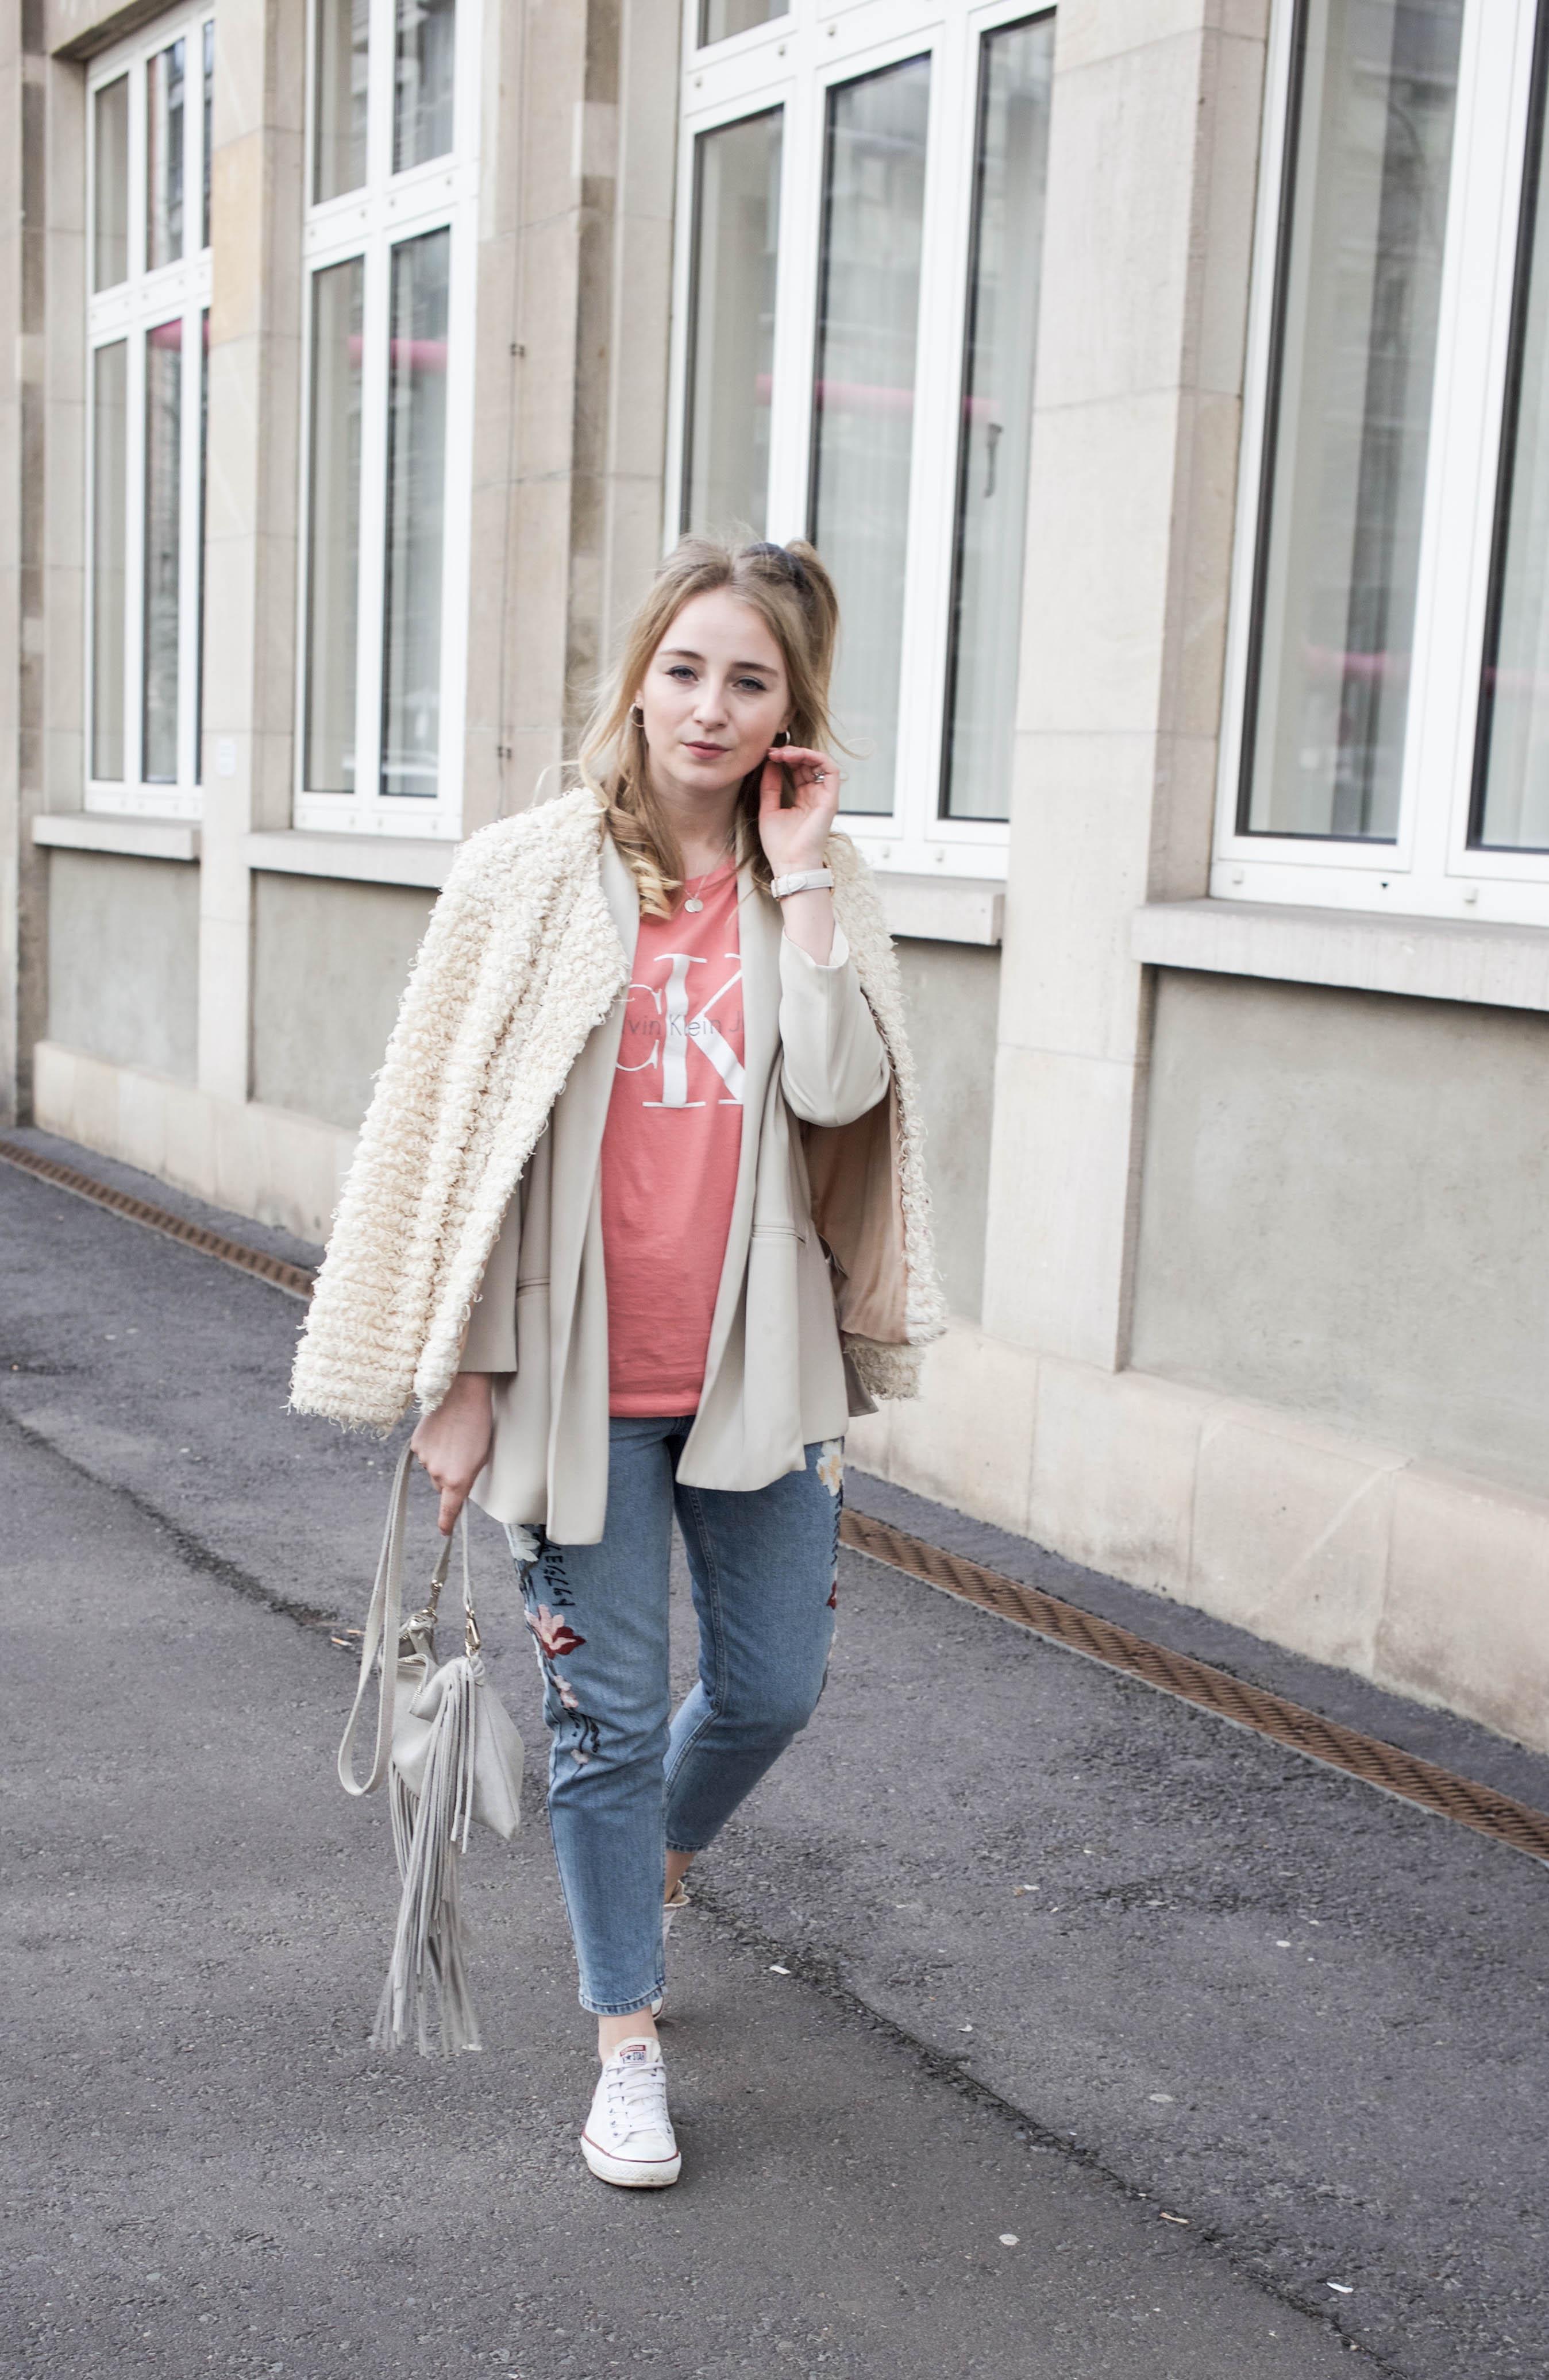 Frühlingslook-Berlin-Mom-Jeans-Blumenprint-Fashionblog-Blogger-Calvin-Klein-Tshirt-streetstyle_4717